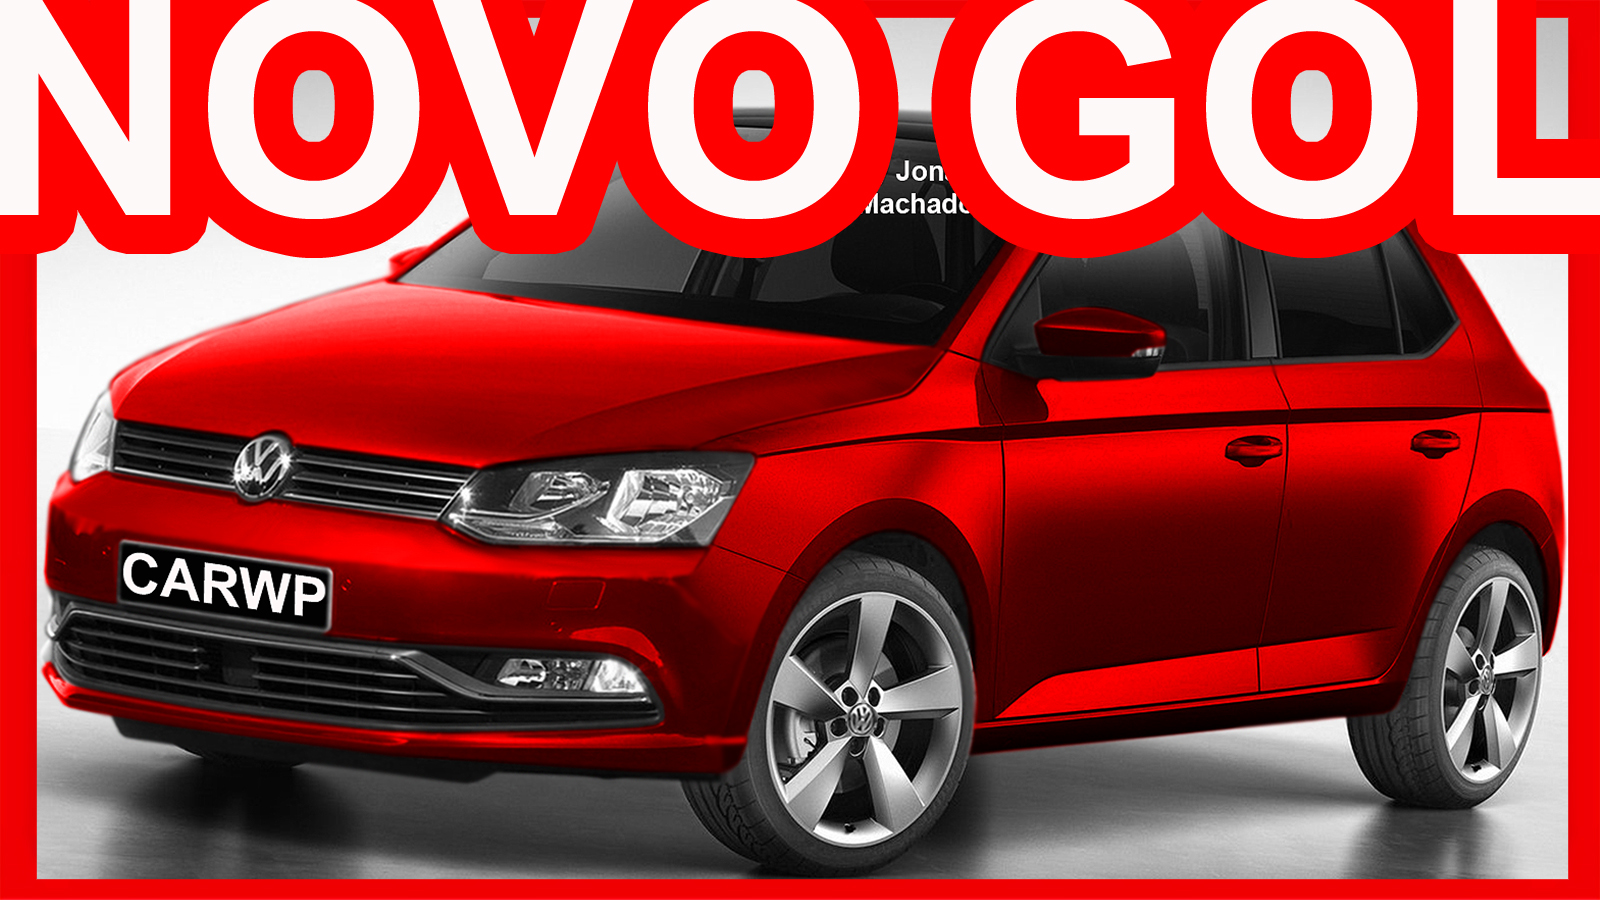 Novo Volkswagen Gol G7 2018 Tsi 82 Cv 150 Cv Mini Golf